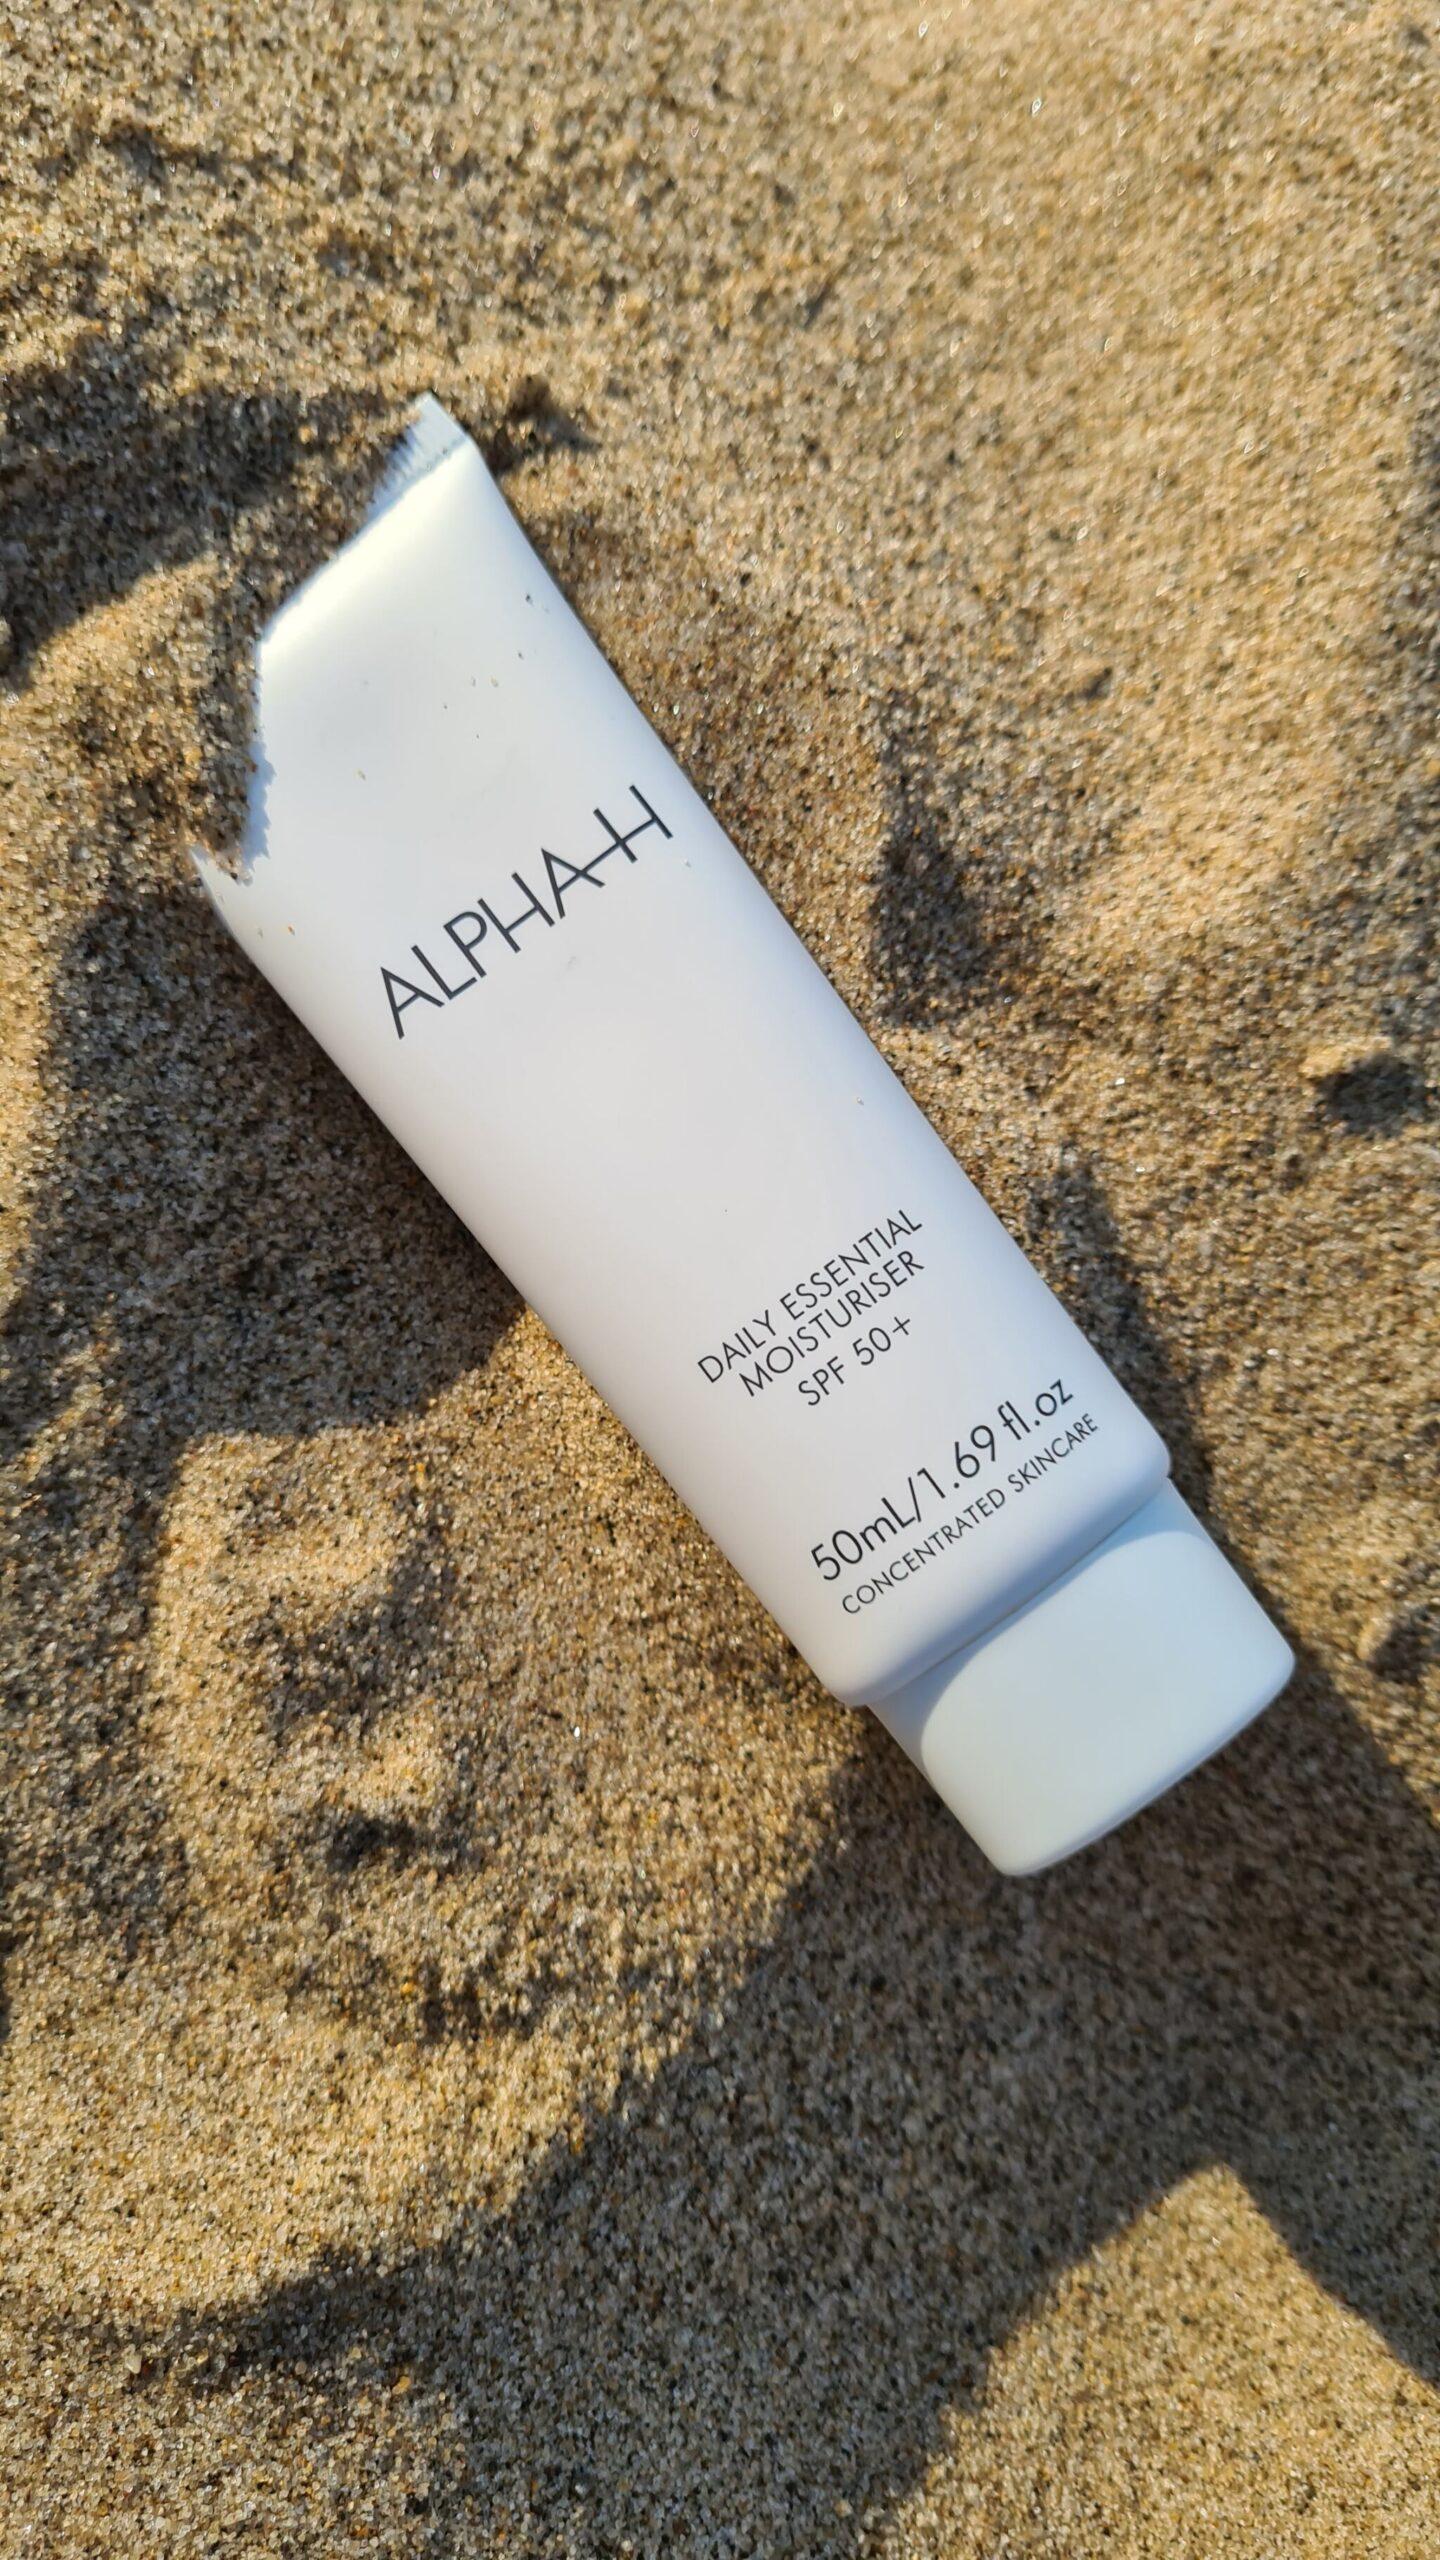 Alpha-H moisturiser with SPF